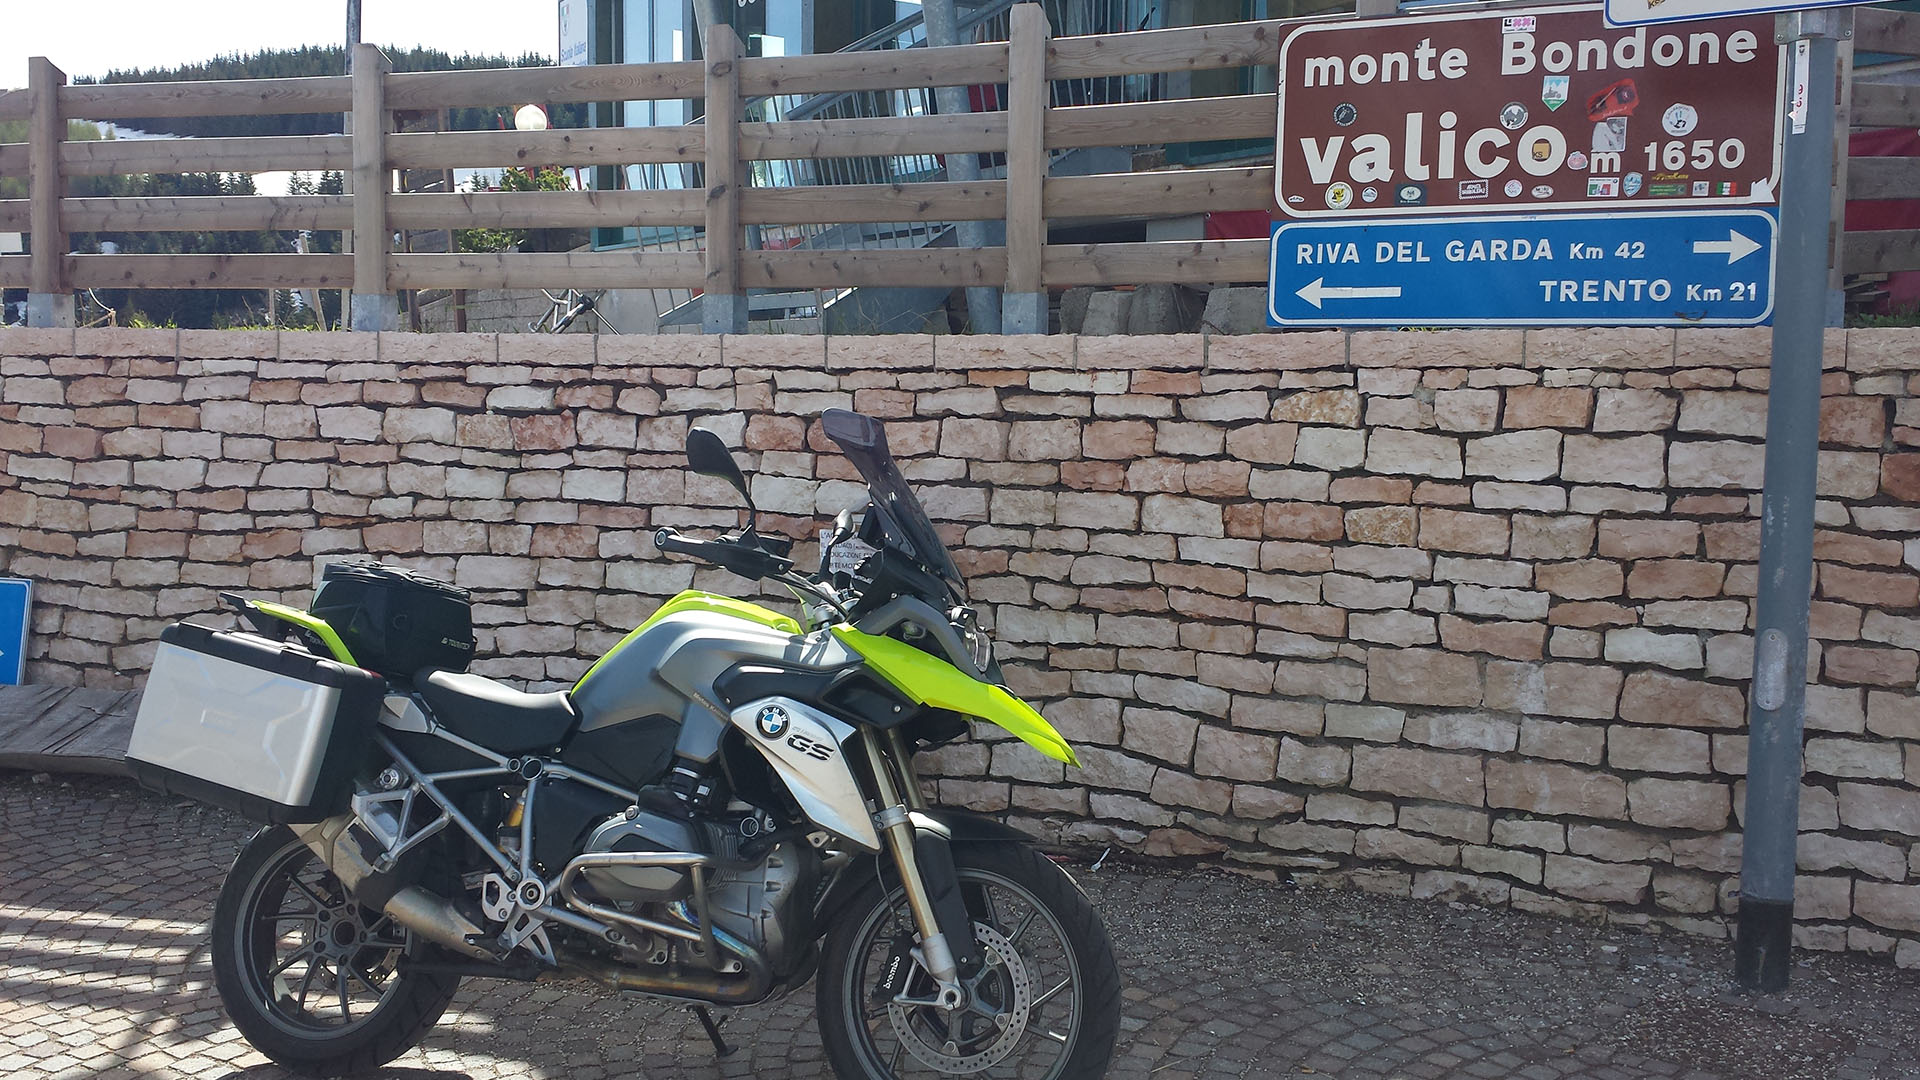 1650 - I - Monte Bondone